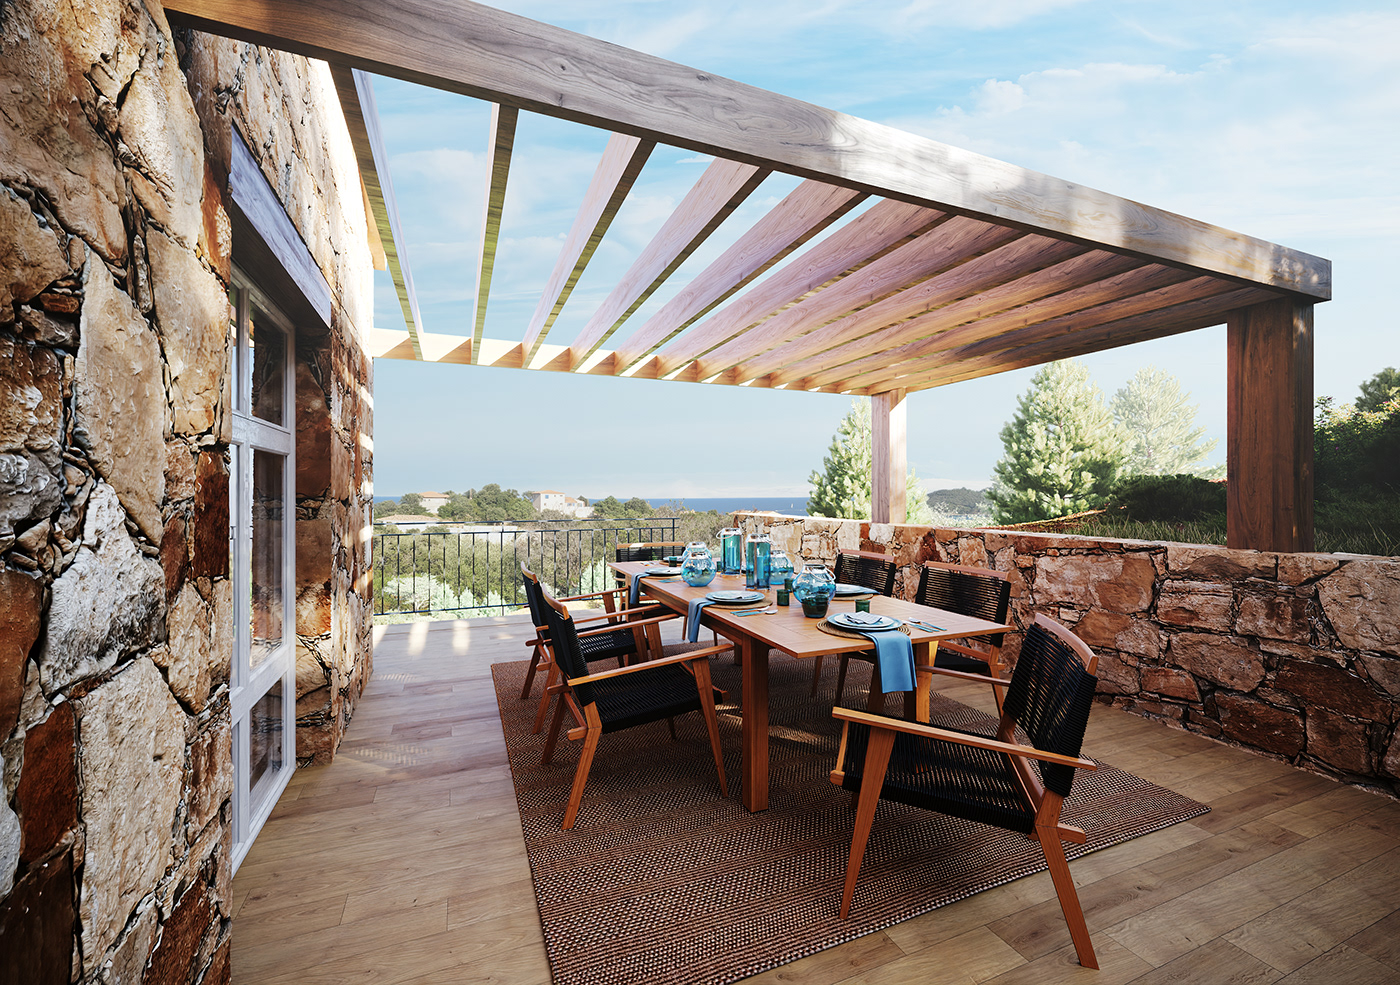 Interior exteriror design ideas realestate traditional luxury